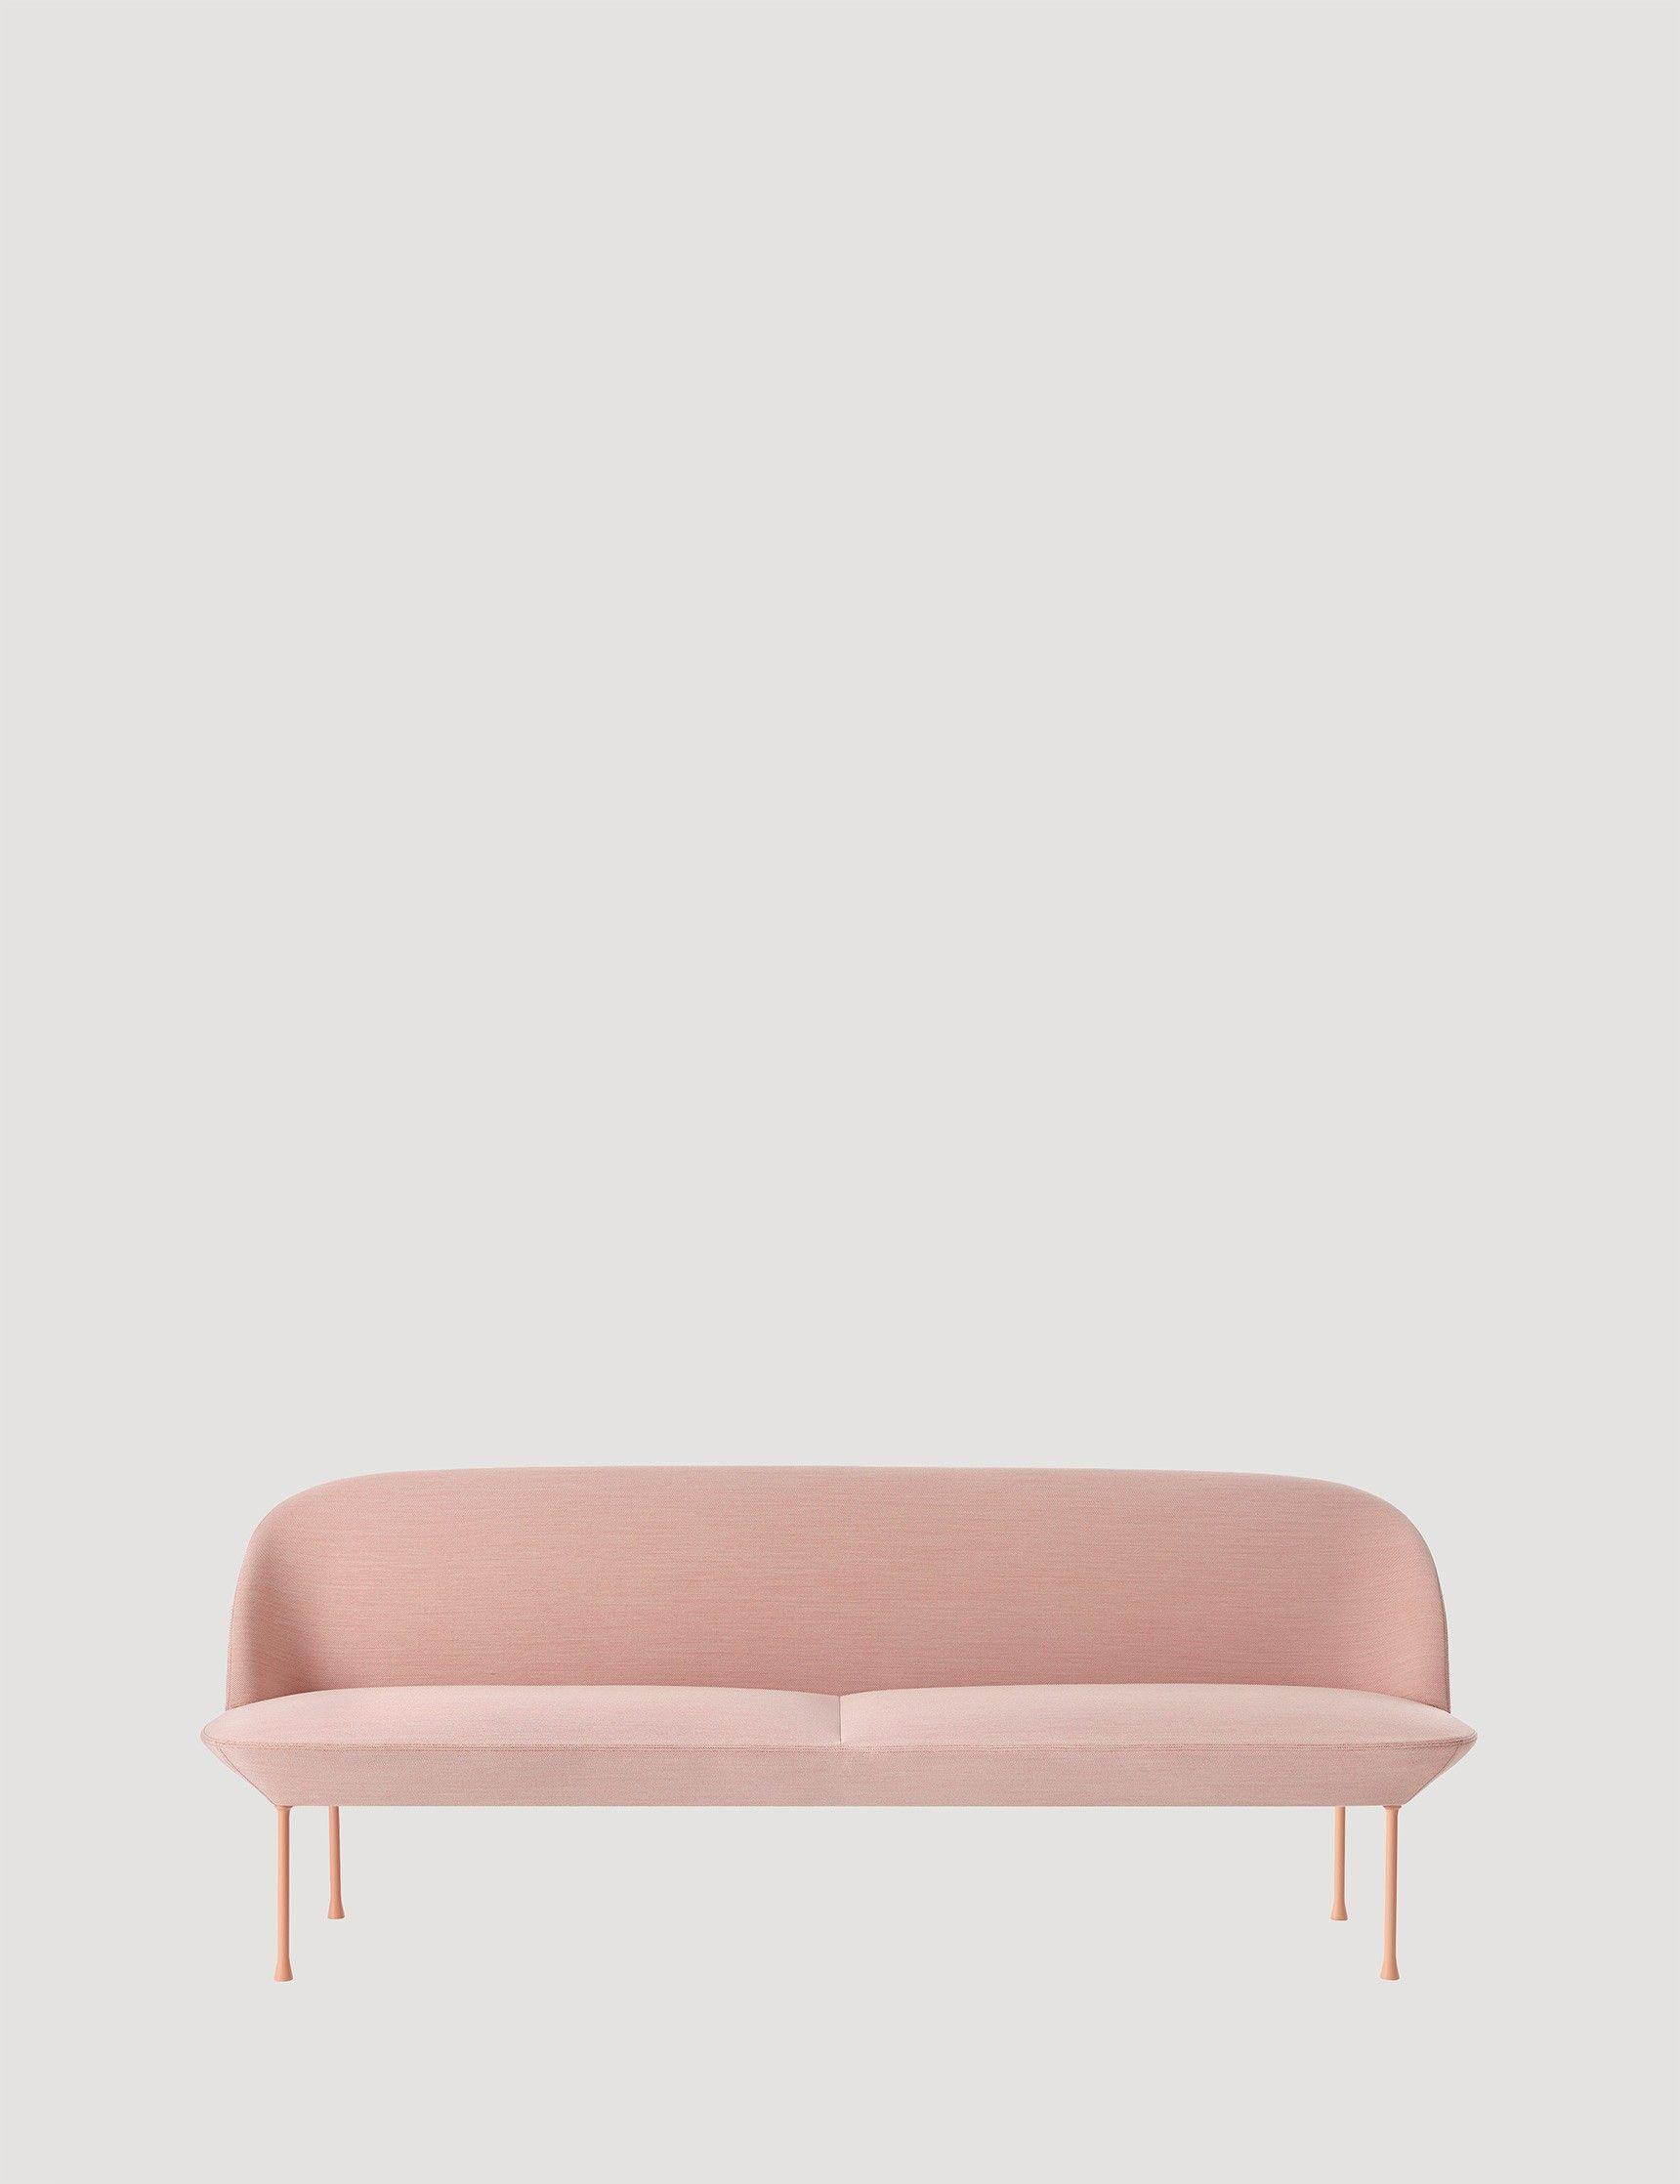 Schlafsofa designklassiker  OSLO - Modern Scandinavian Design 3-Seat Sofa by Muuto - Muuto ...